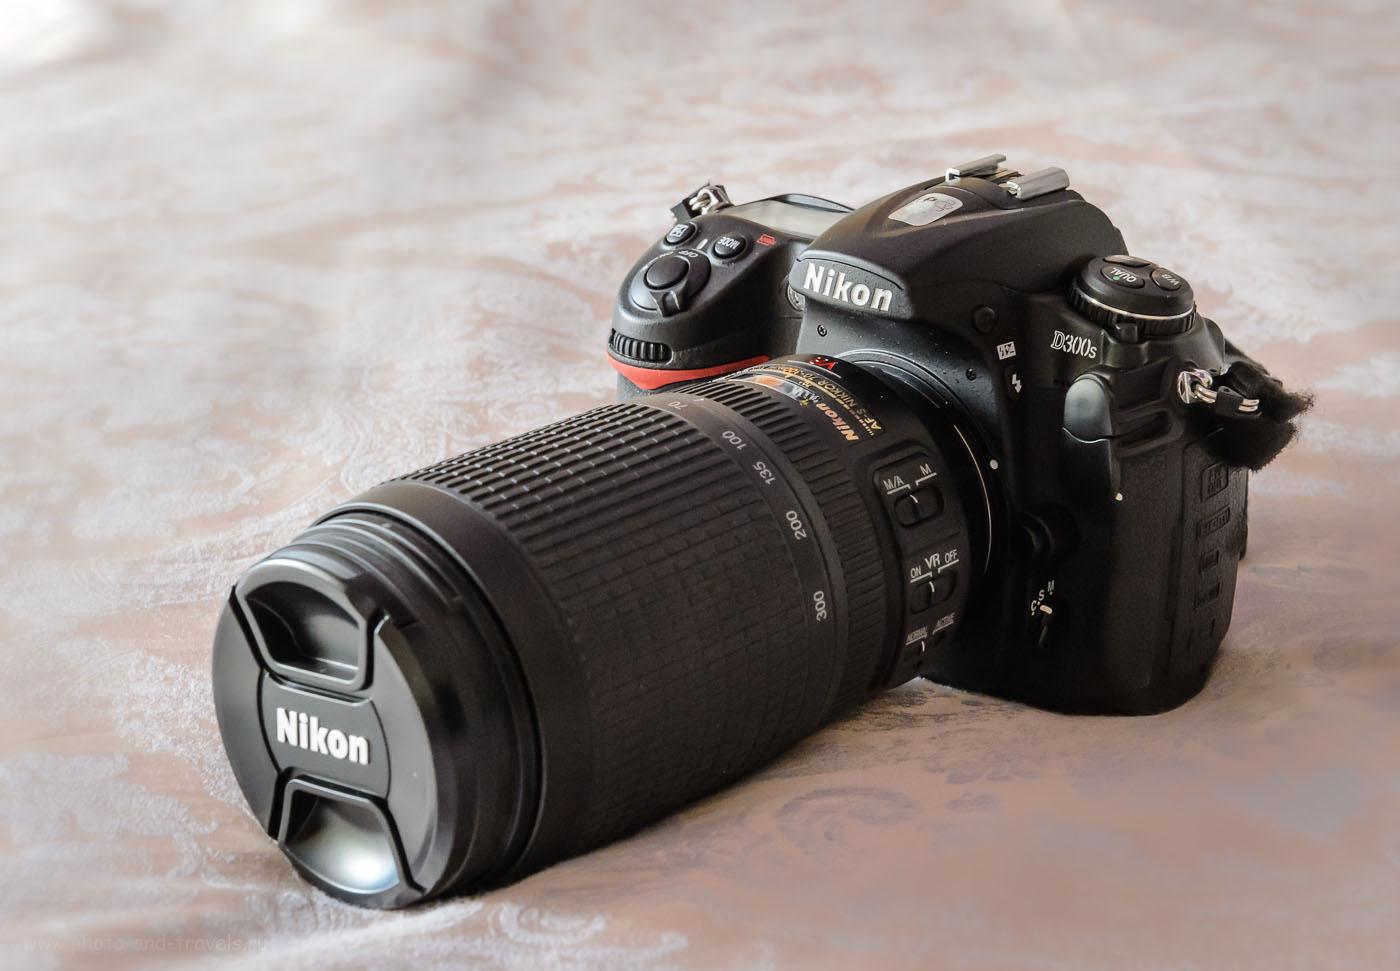 Внешний вид камеры Nikon D300s с объективом Nikon 70-300mm f/4.5-5.6G. Обзор с примерами фотографий.